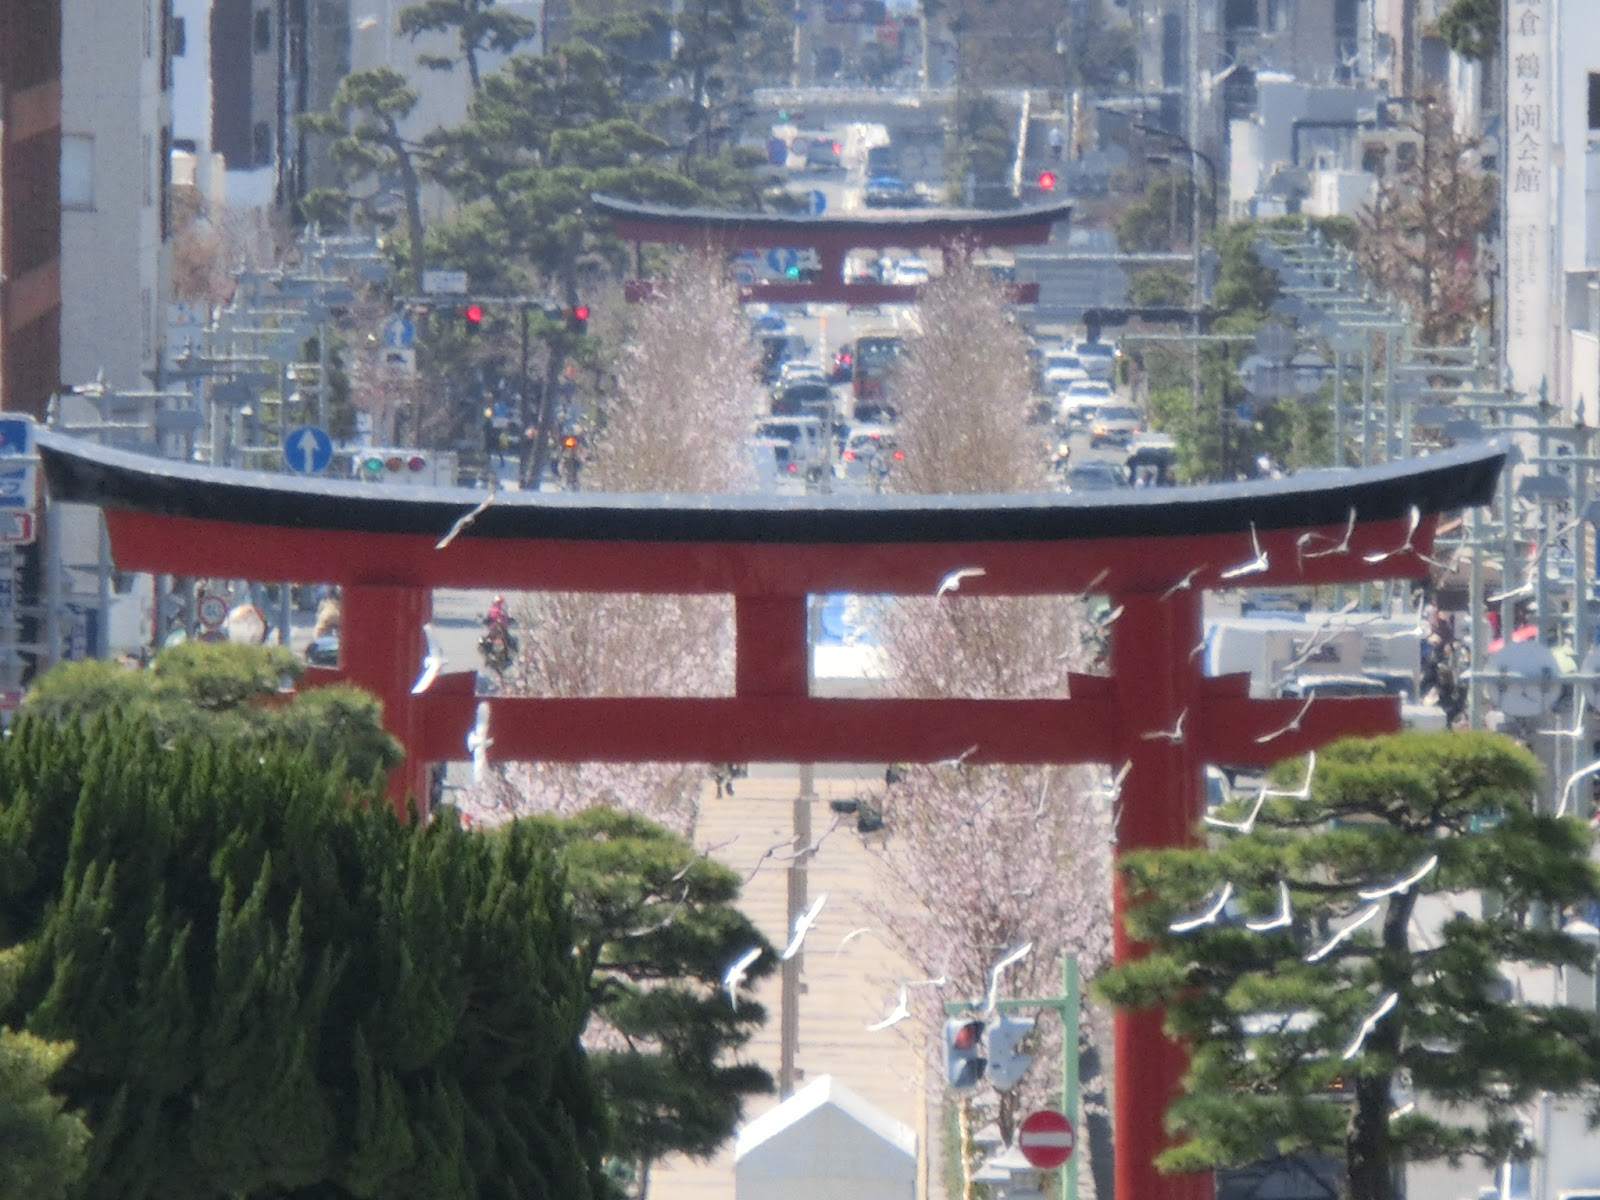 okadoのブログ~鎌倉散策の記録~: 今日は・・・鶴岡八幡宮の参道・段葛の竣功式2016/03/30